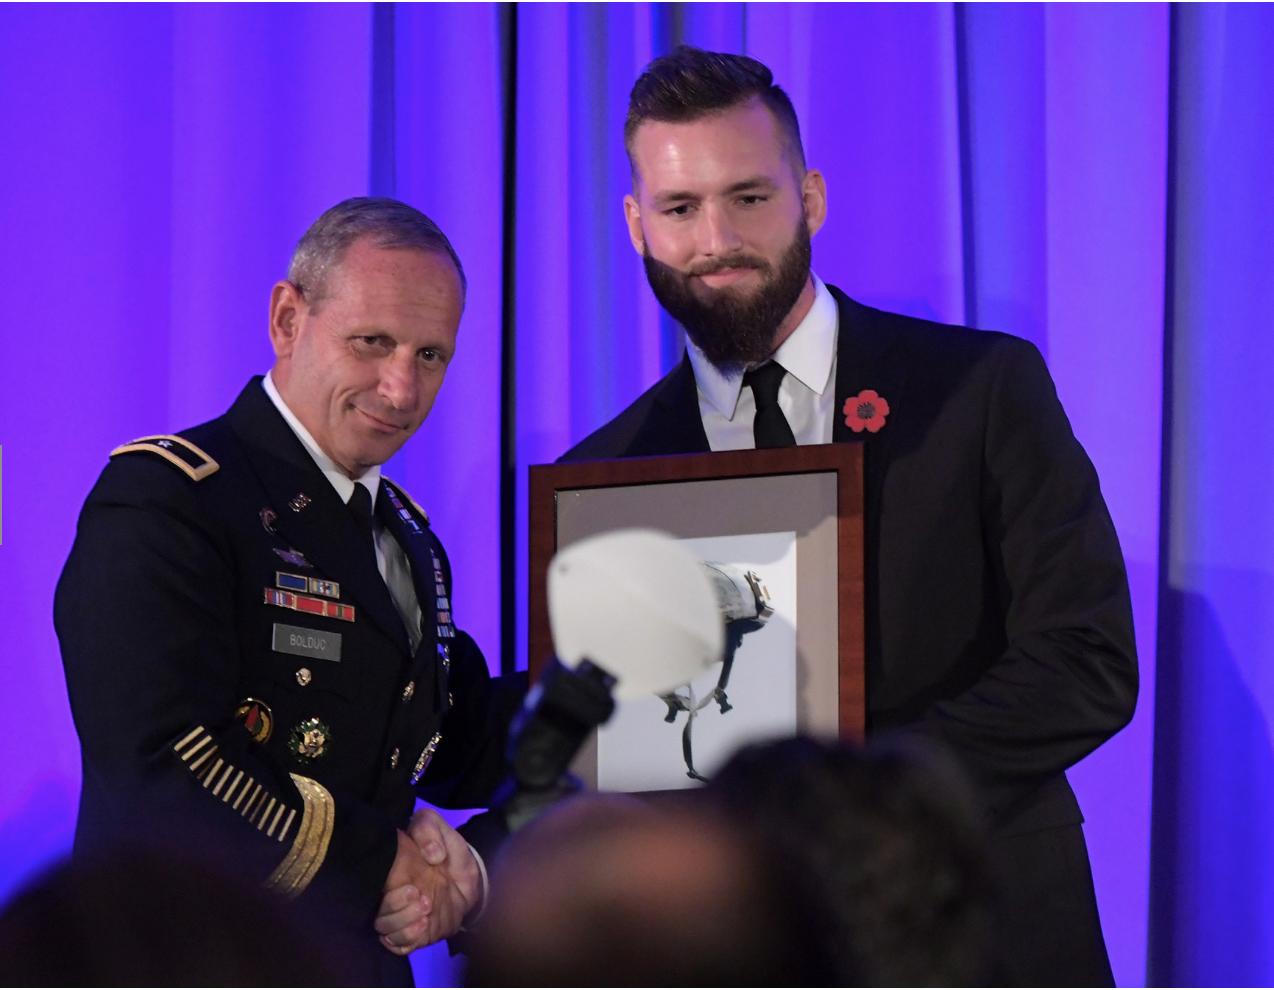 2017Headstrong Gala - Receiving the Moral Courage Award